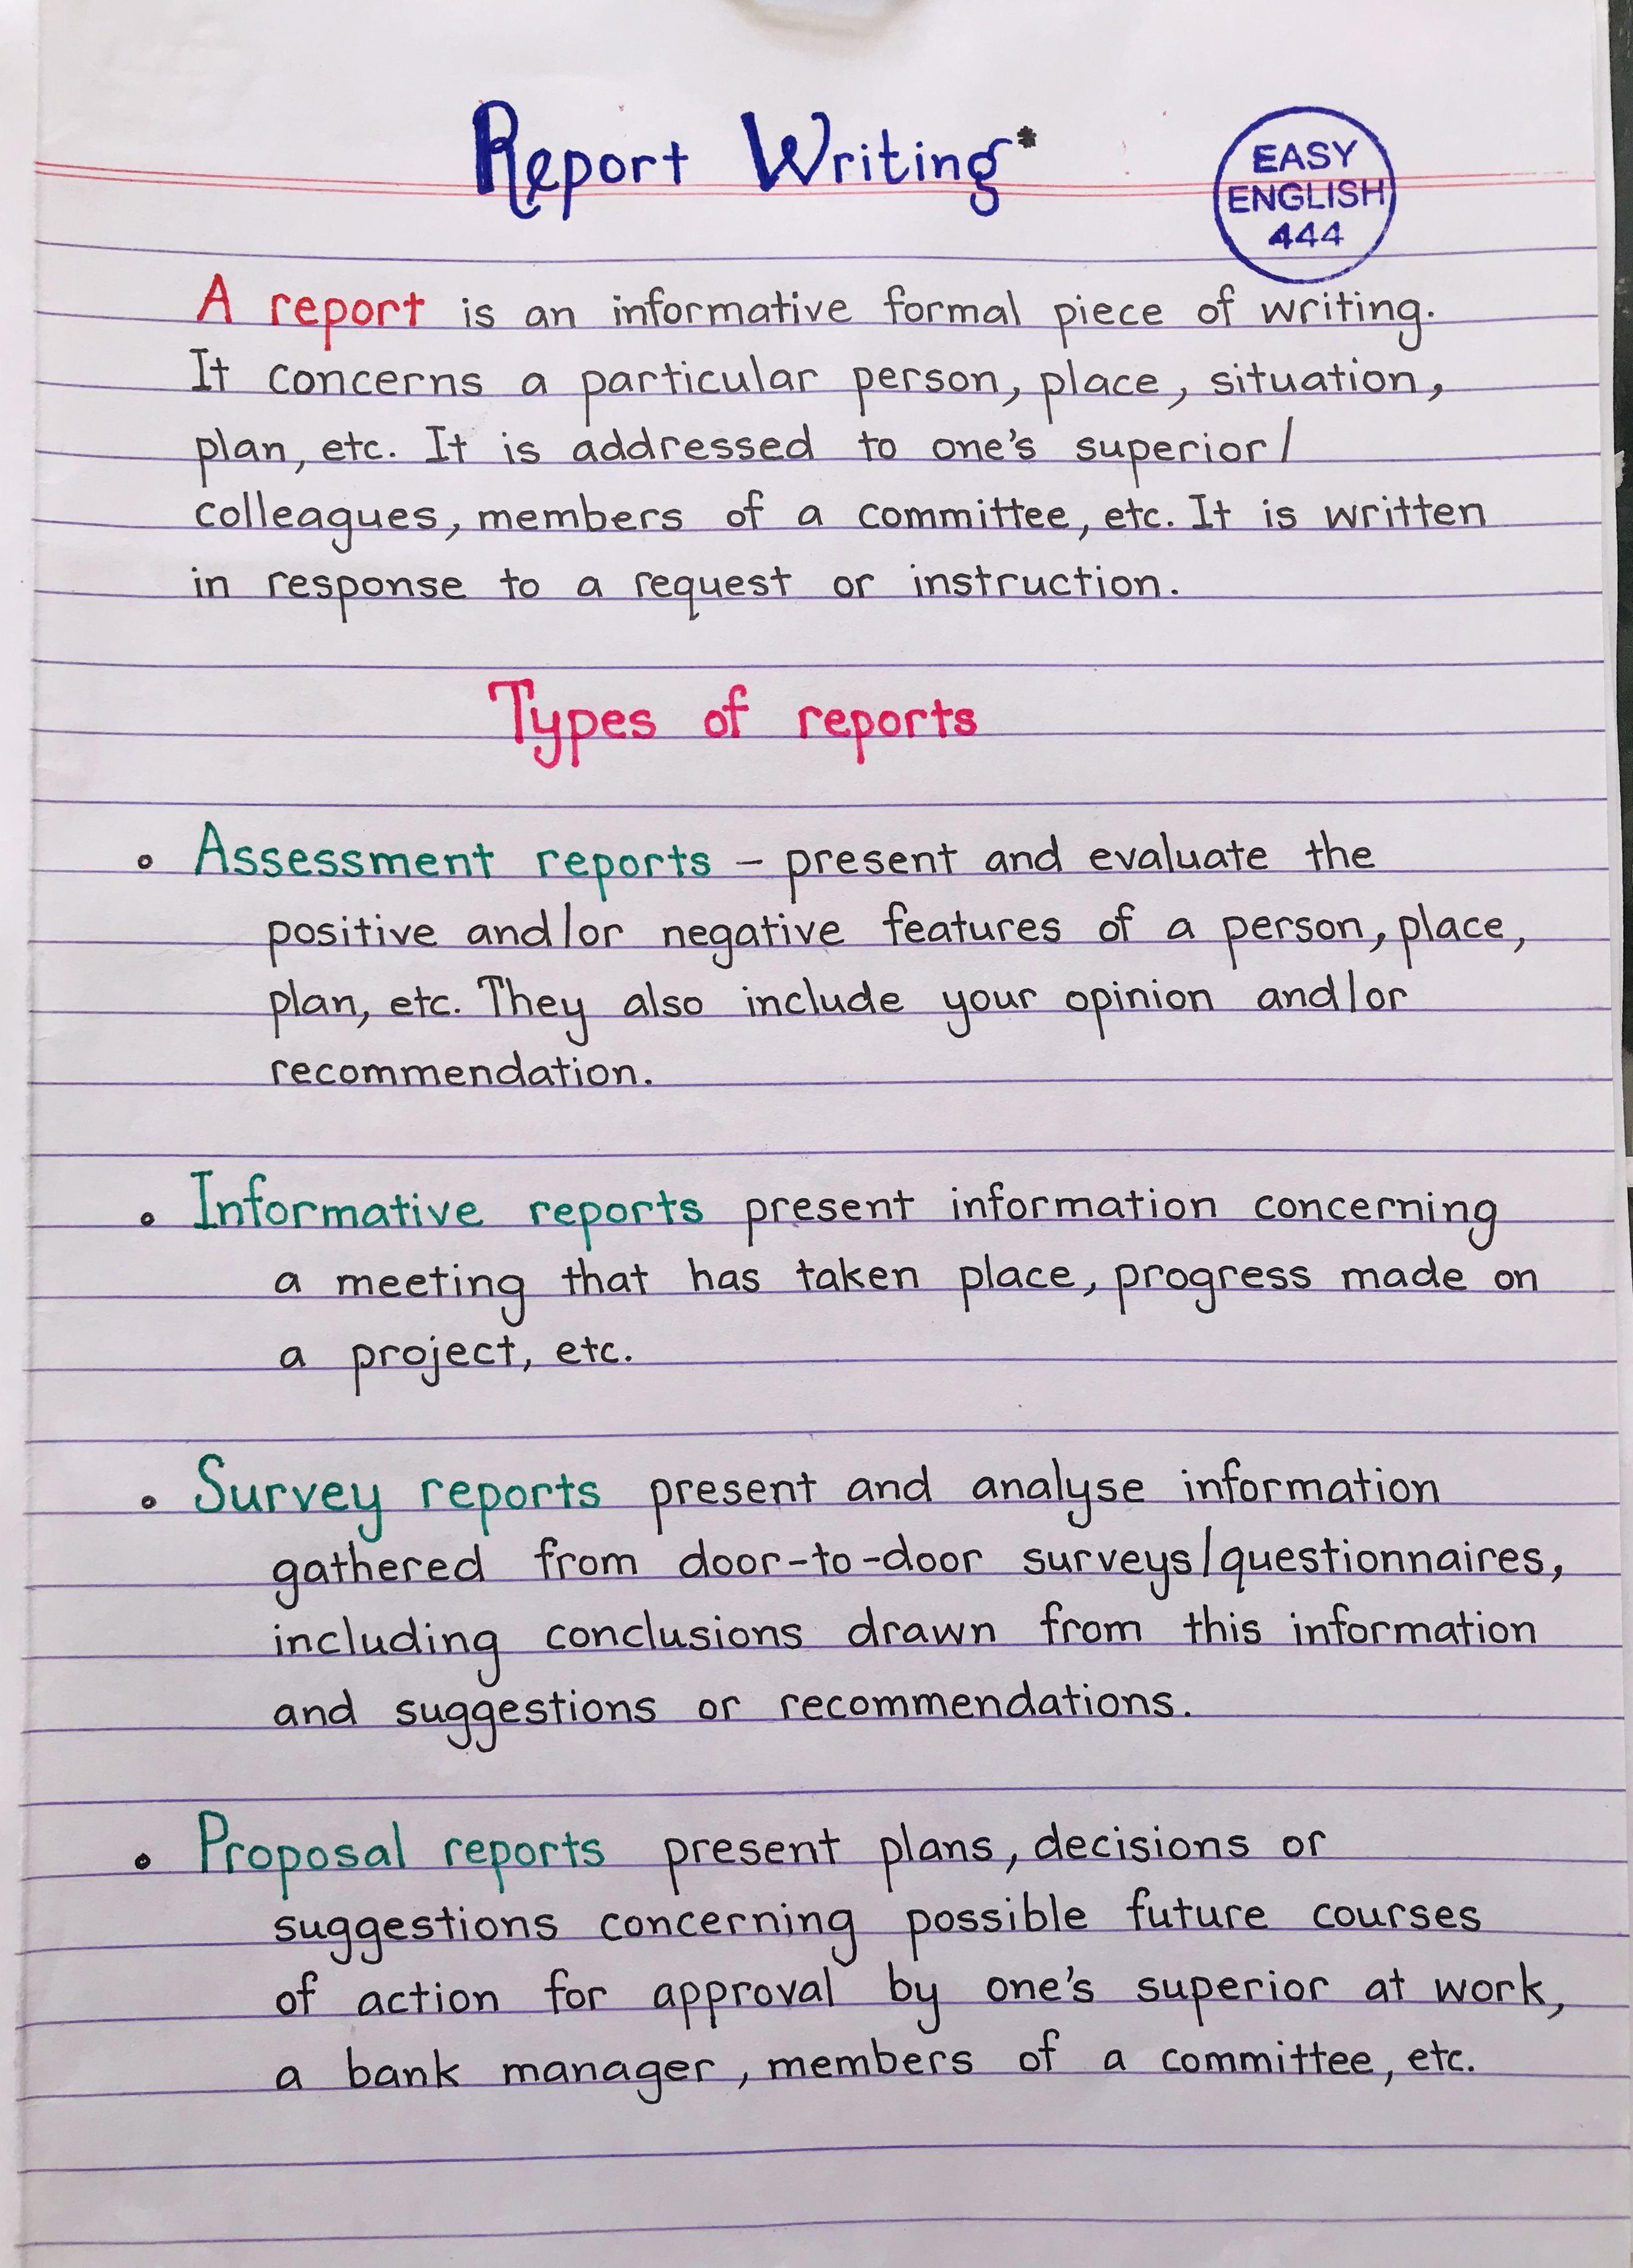 Learn English Writing Handwritten